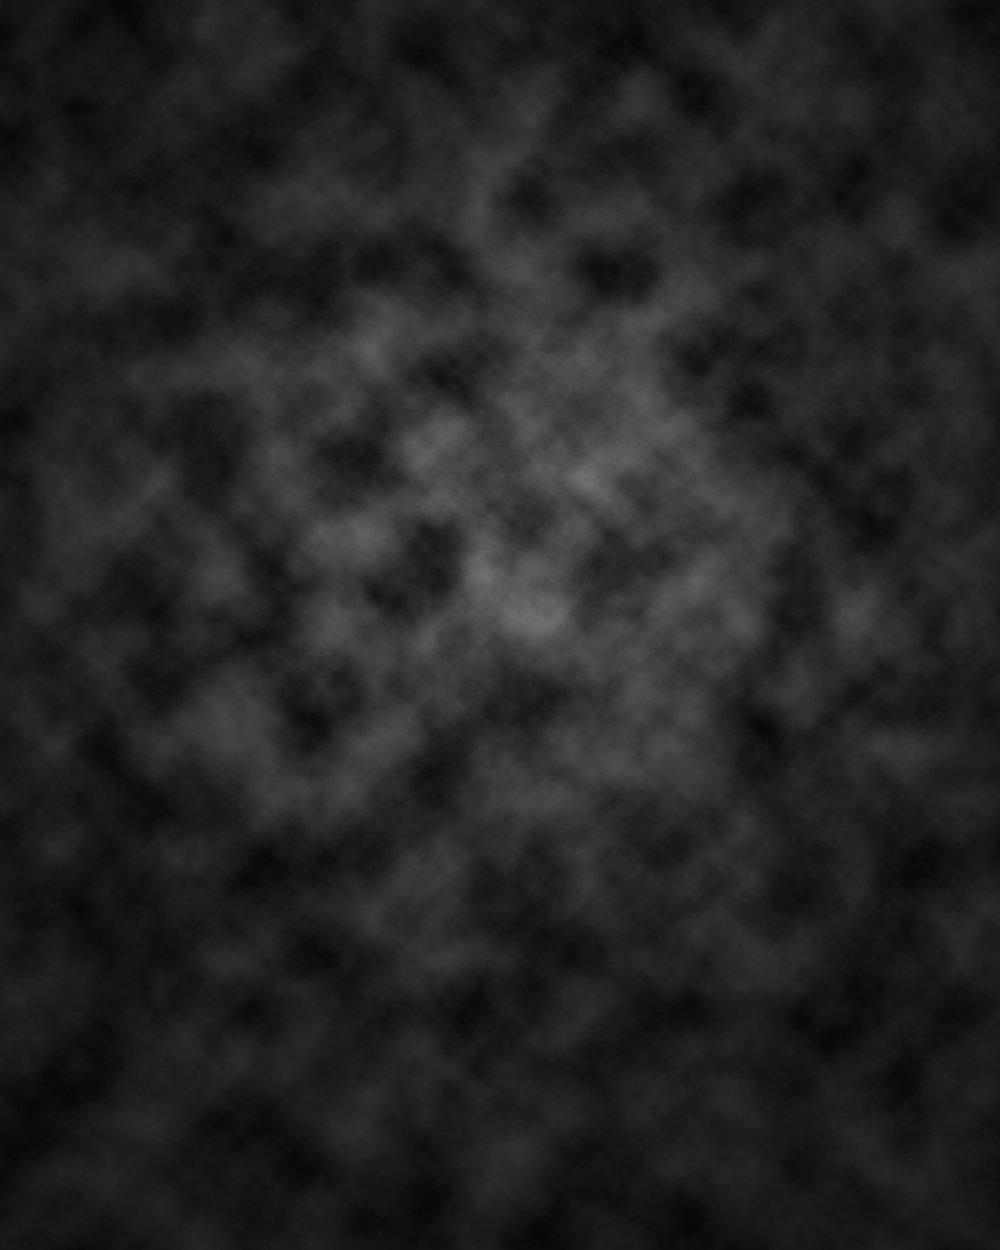 Background Option #2 - Black